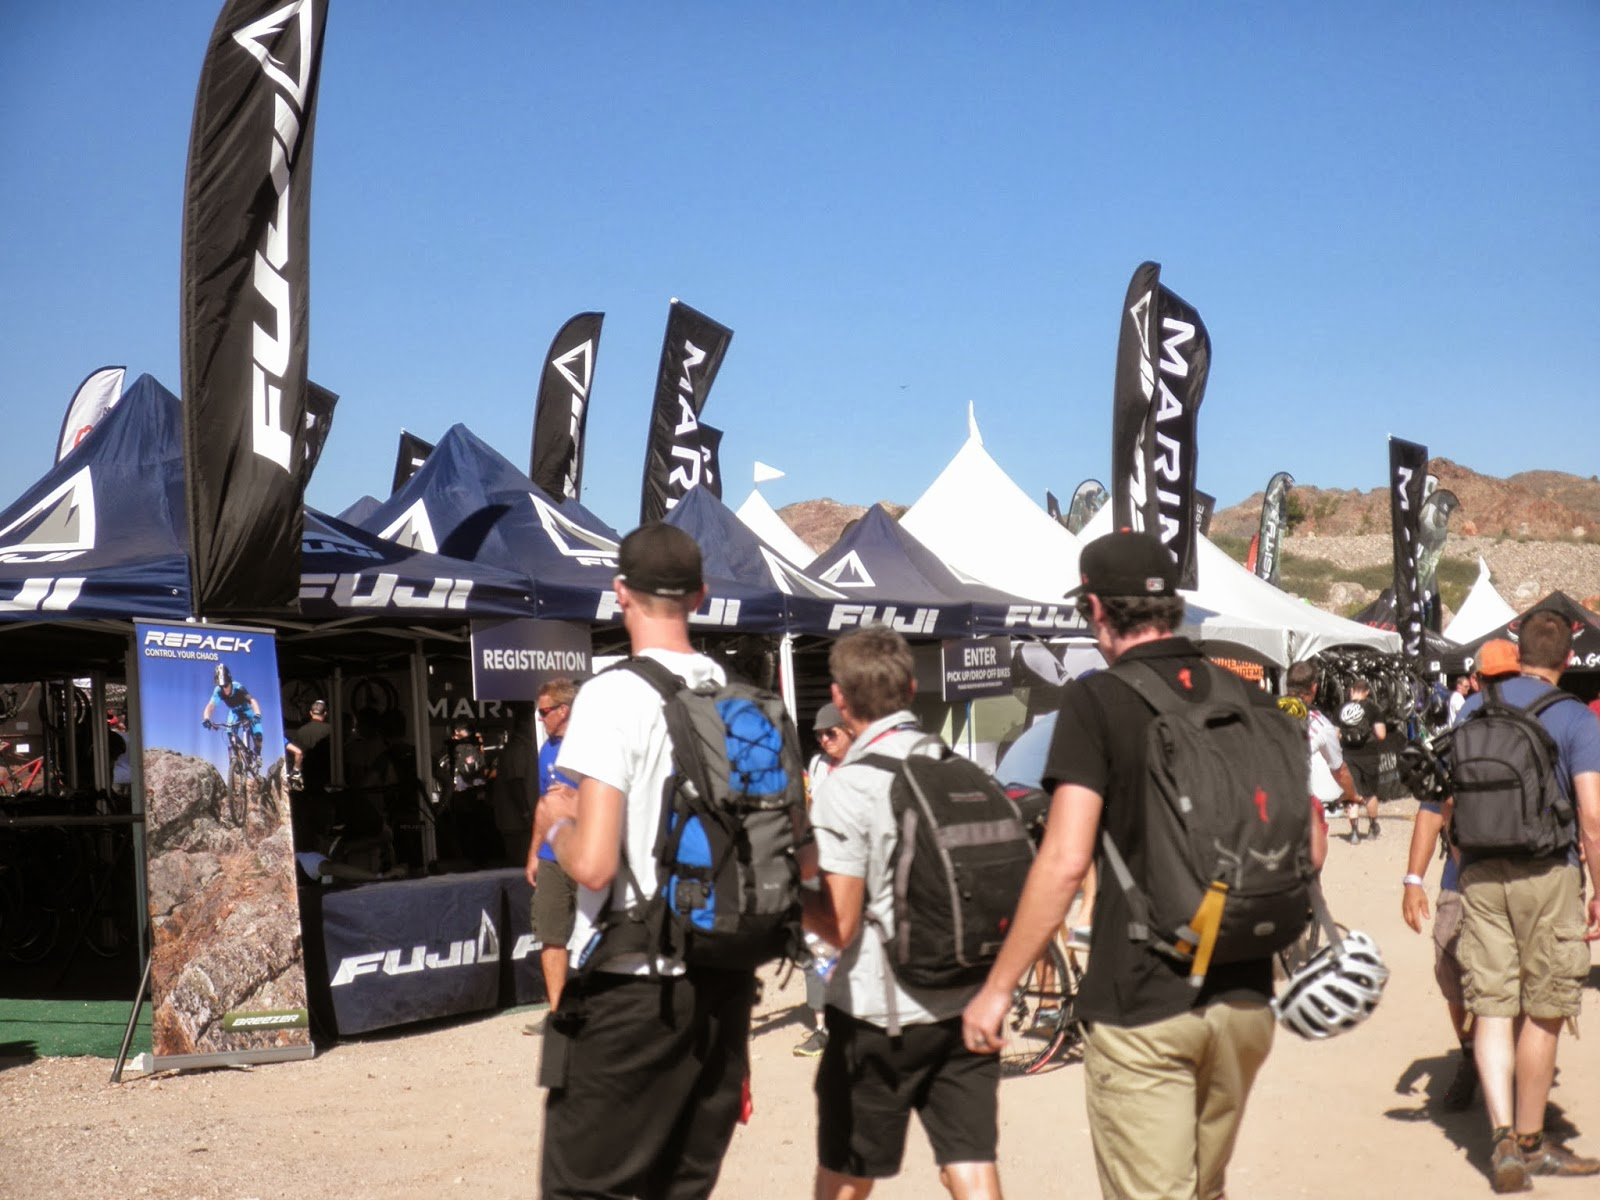 InterBike 2013 Demo Days: Stayin' Alive - Ascent Cycling